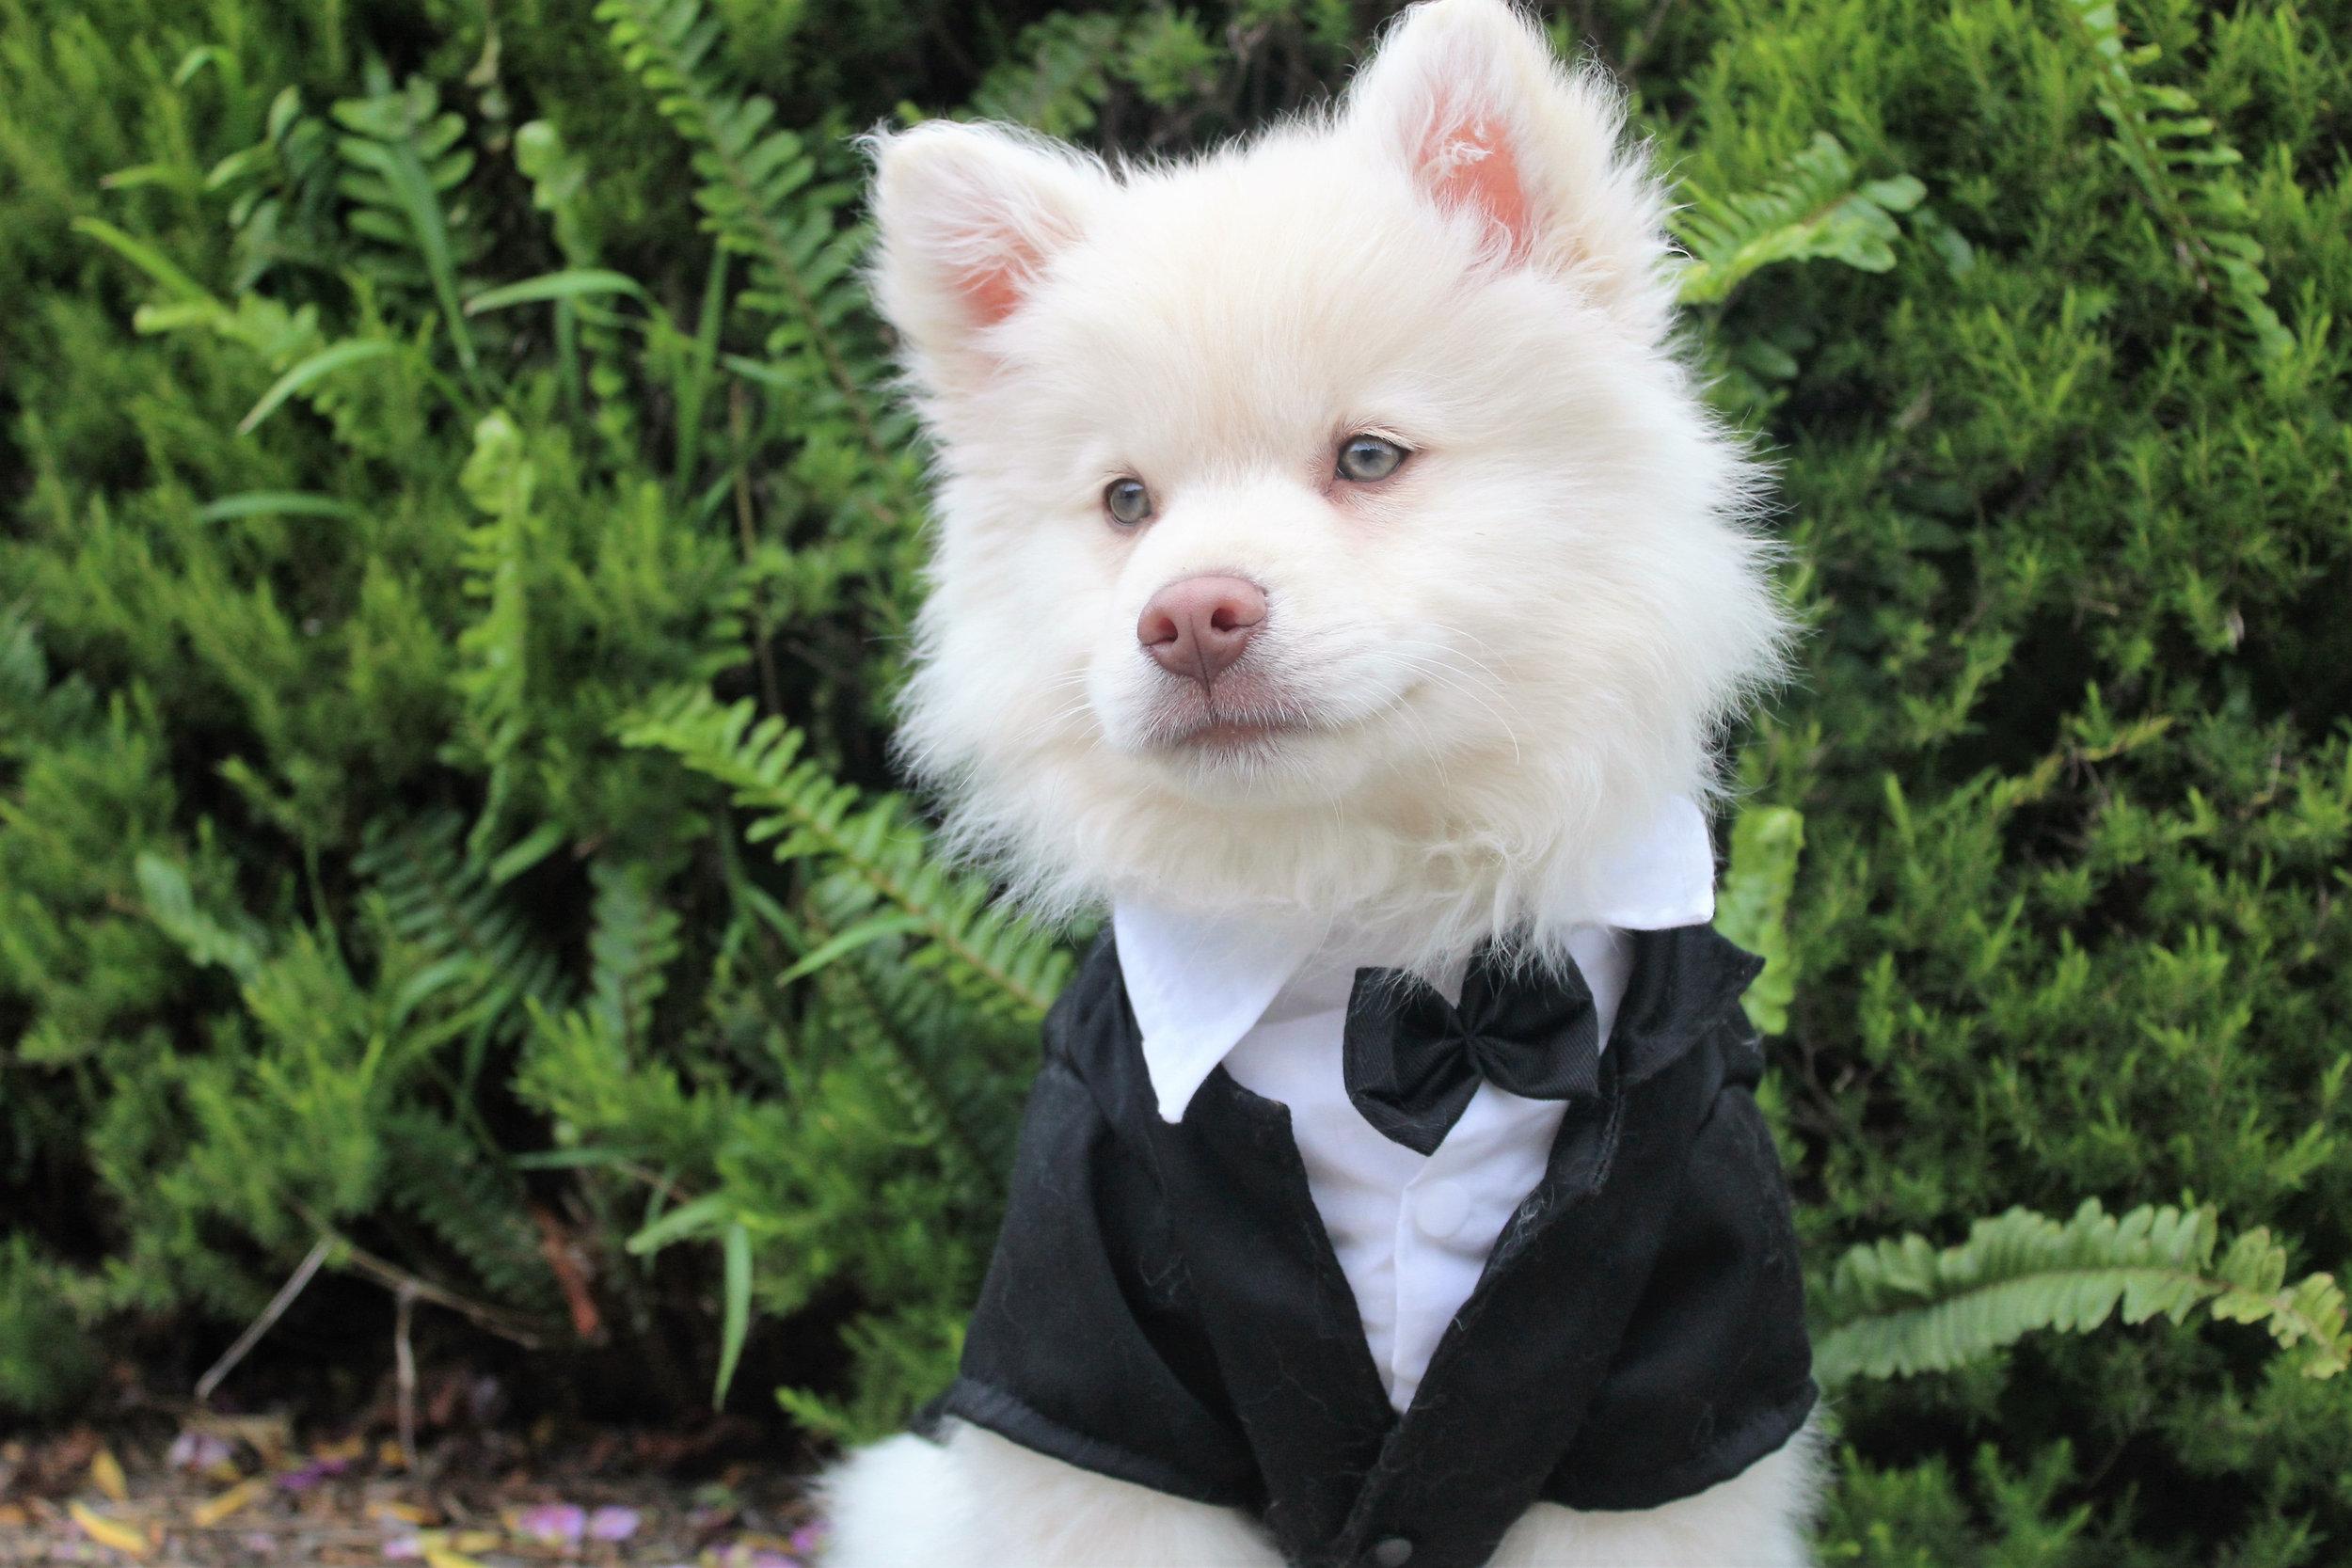 Canva - Dog, Puppy, Tux, Cute, Summer, Cream, White, Smart.jpg